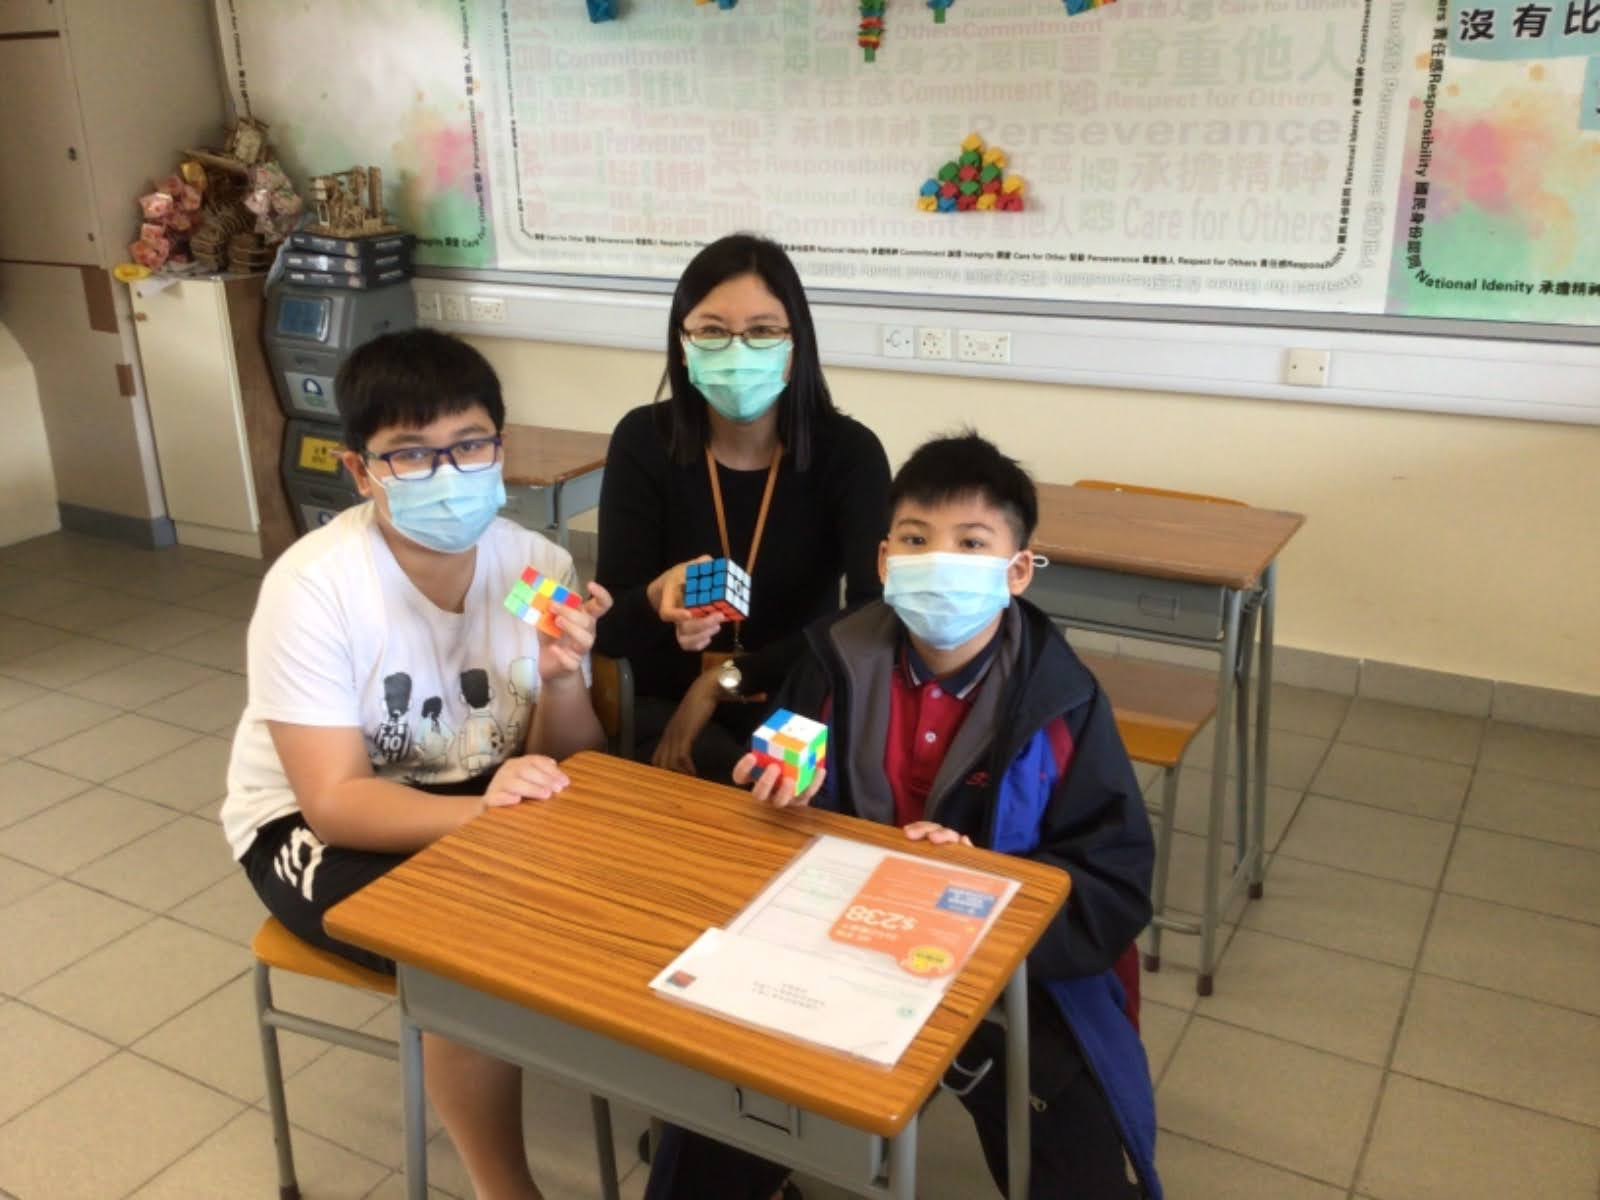 https://shingtak.edu.hk/sites/default/files/whatsapp_image_2020-12-11_at_14.37.48.jpg